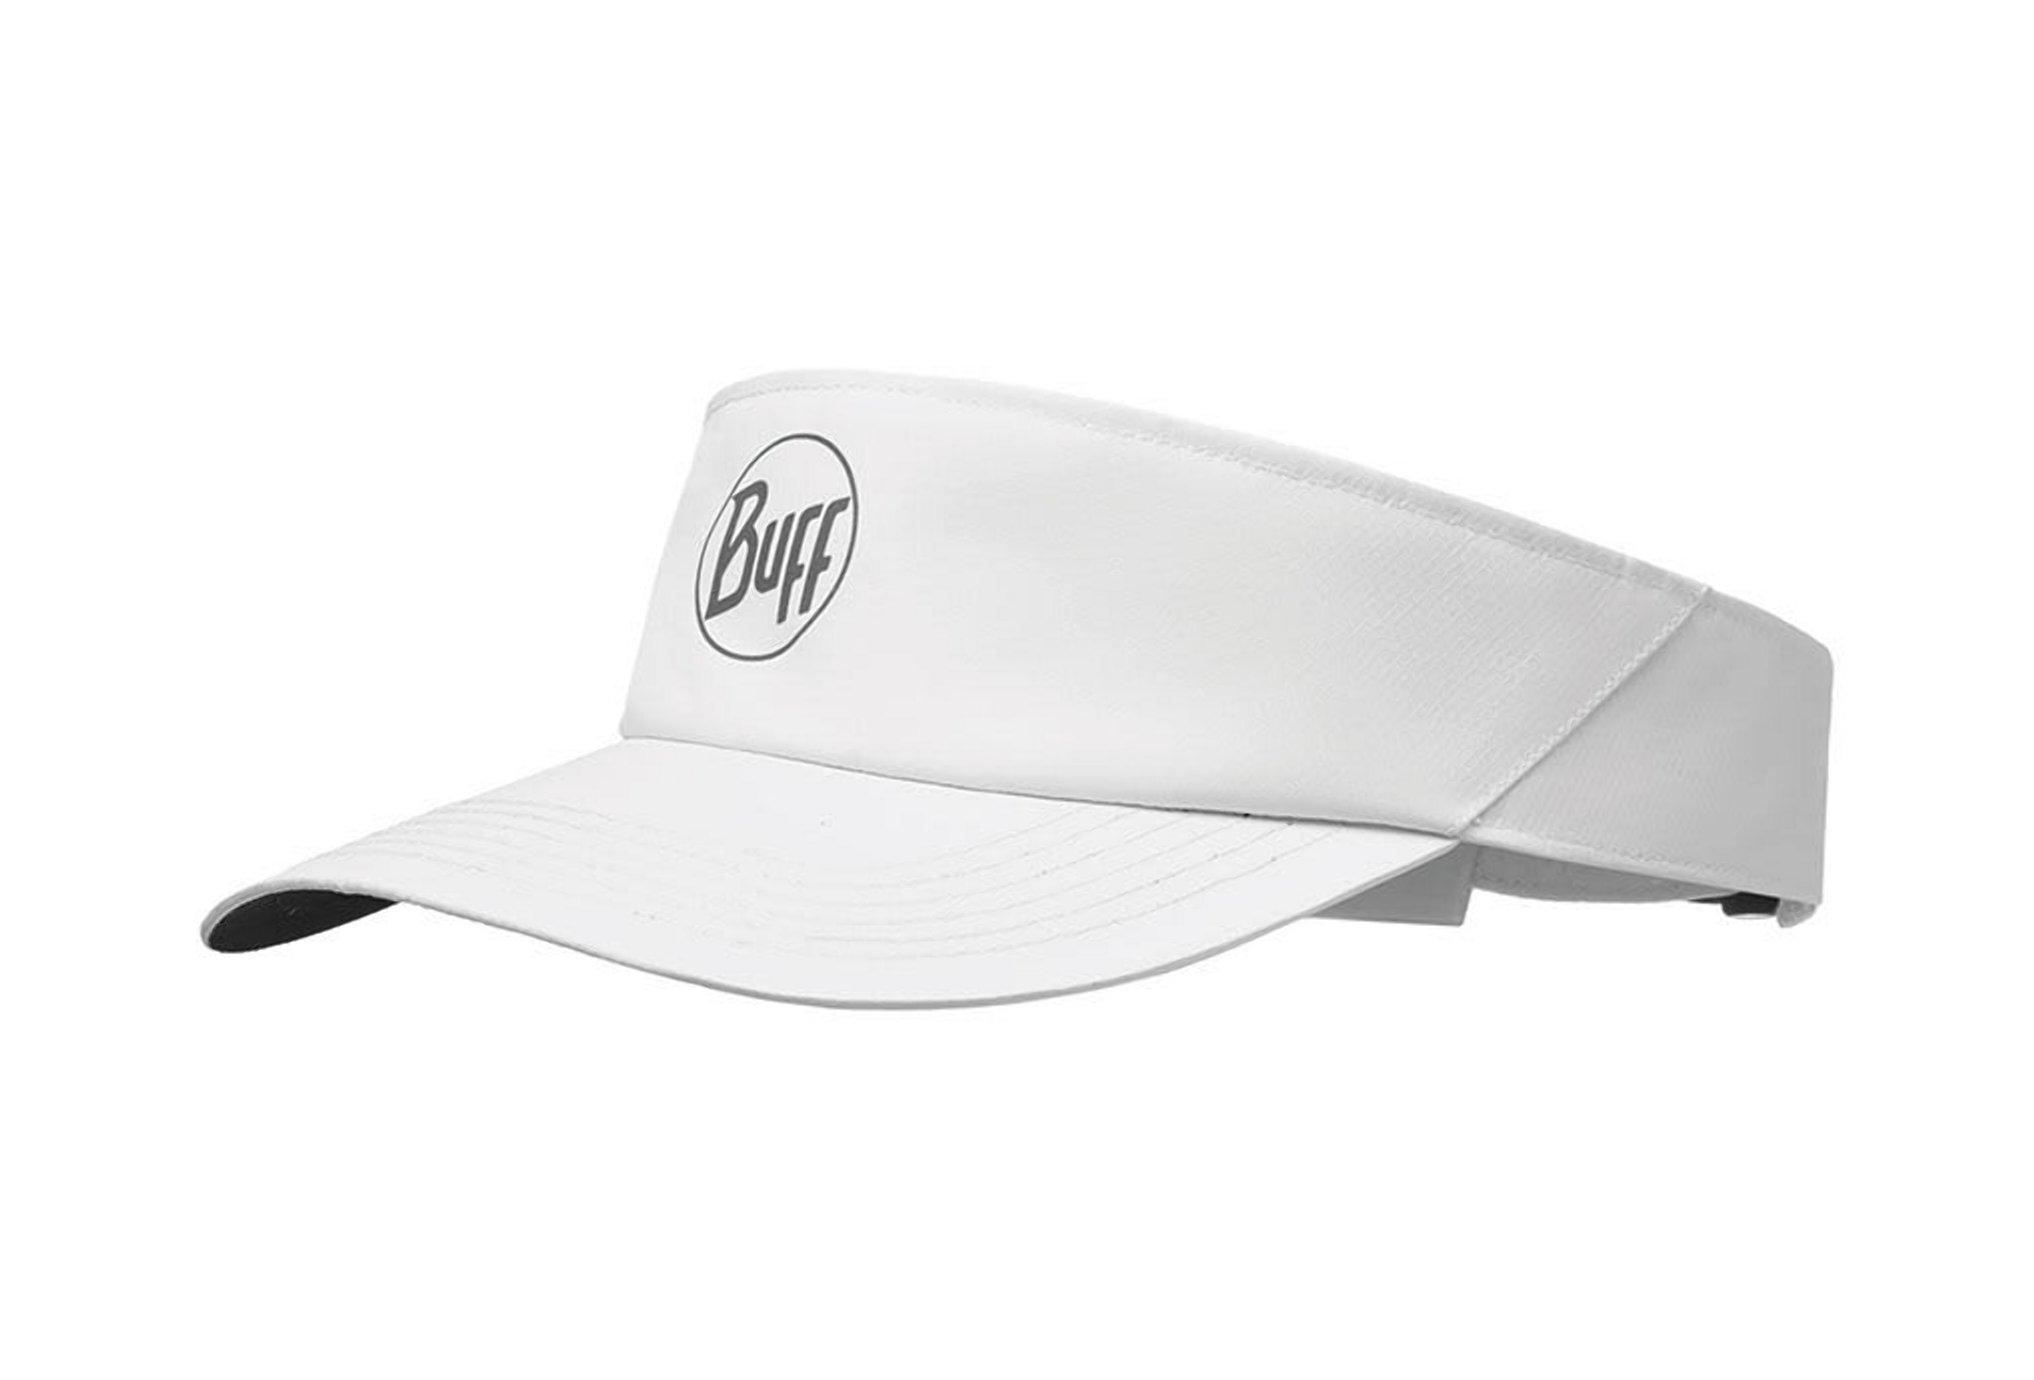 Buff Visor R-Solid White Casquettes / bandeaux